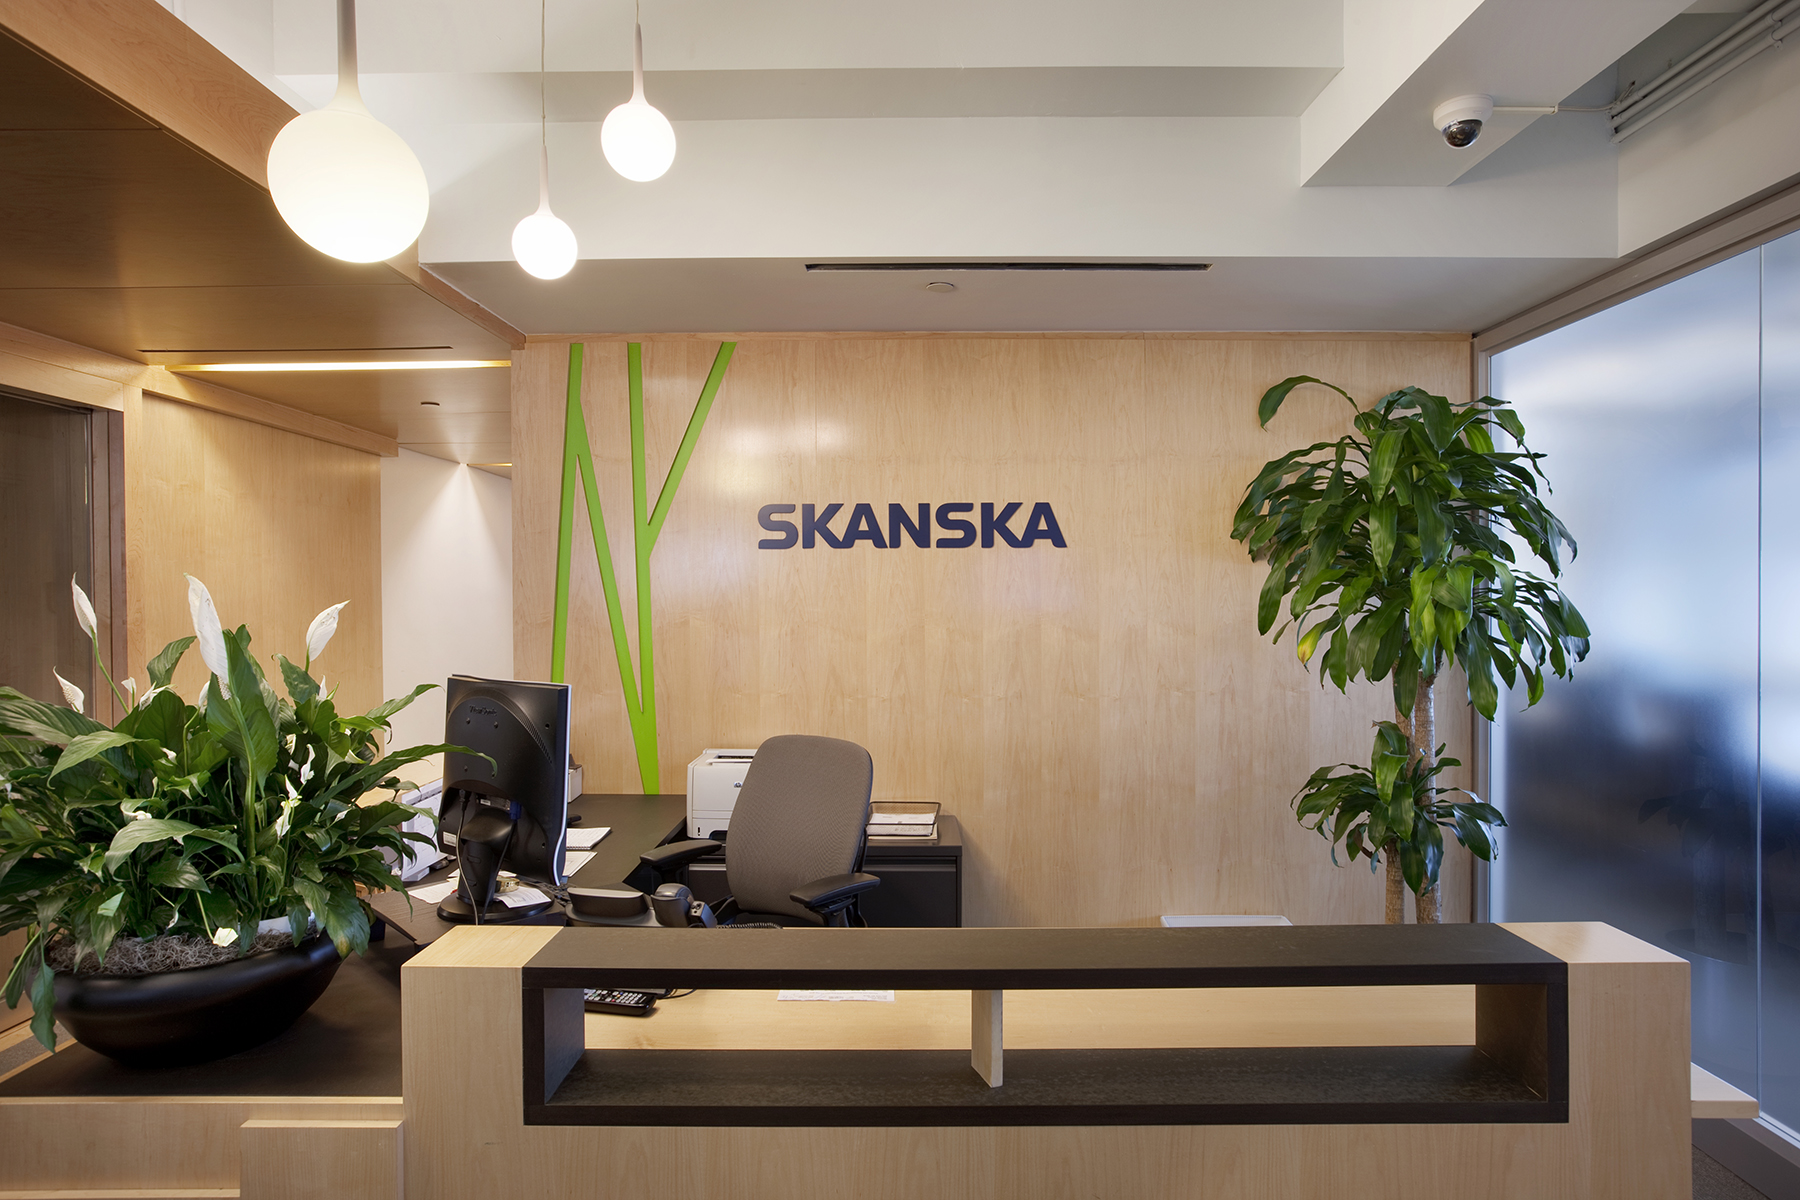 Skanska Lobby At ESB1